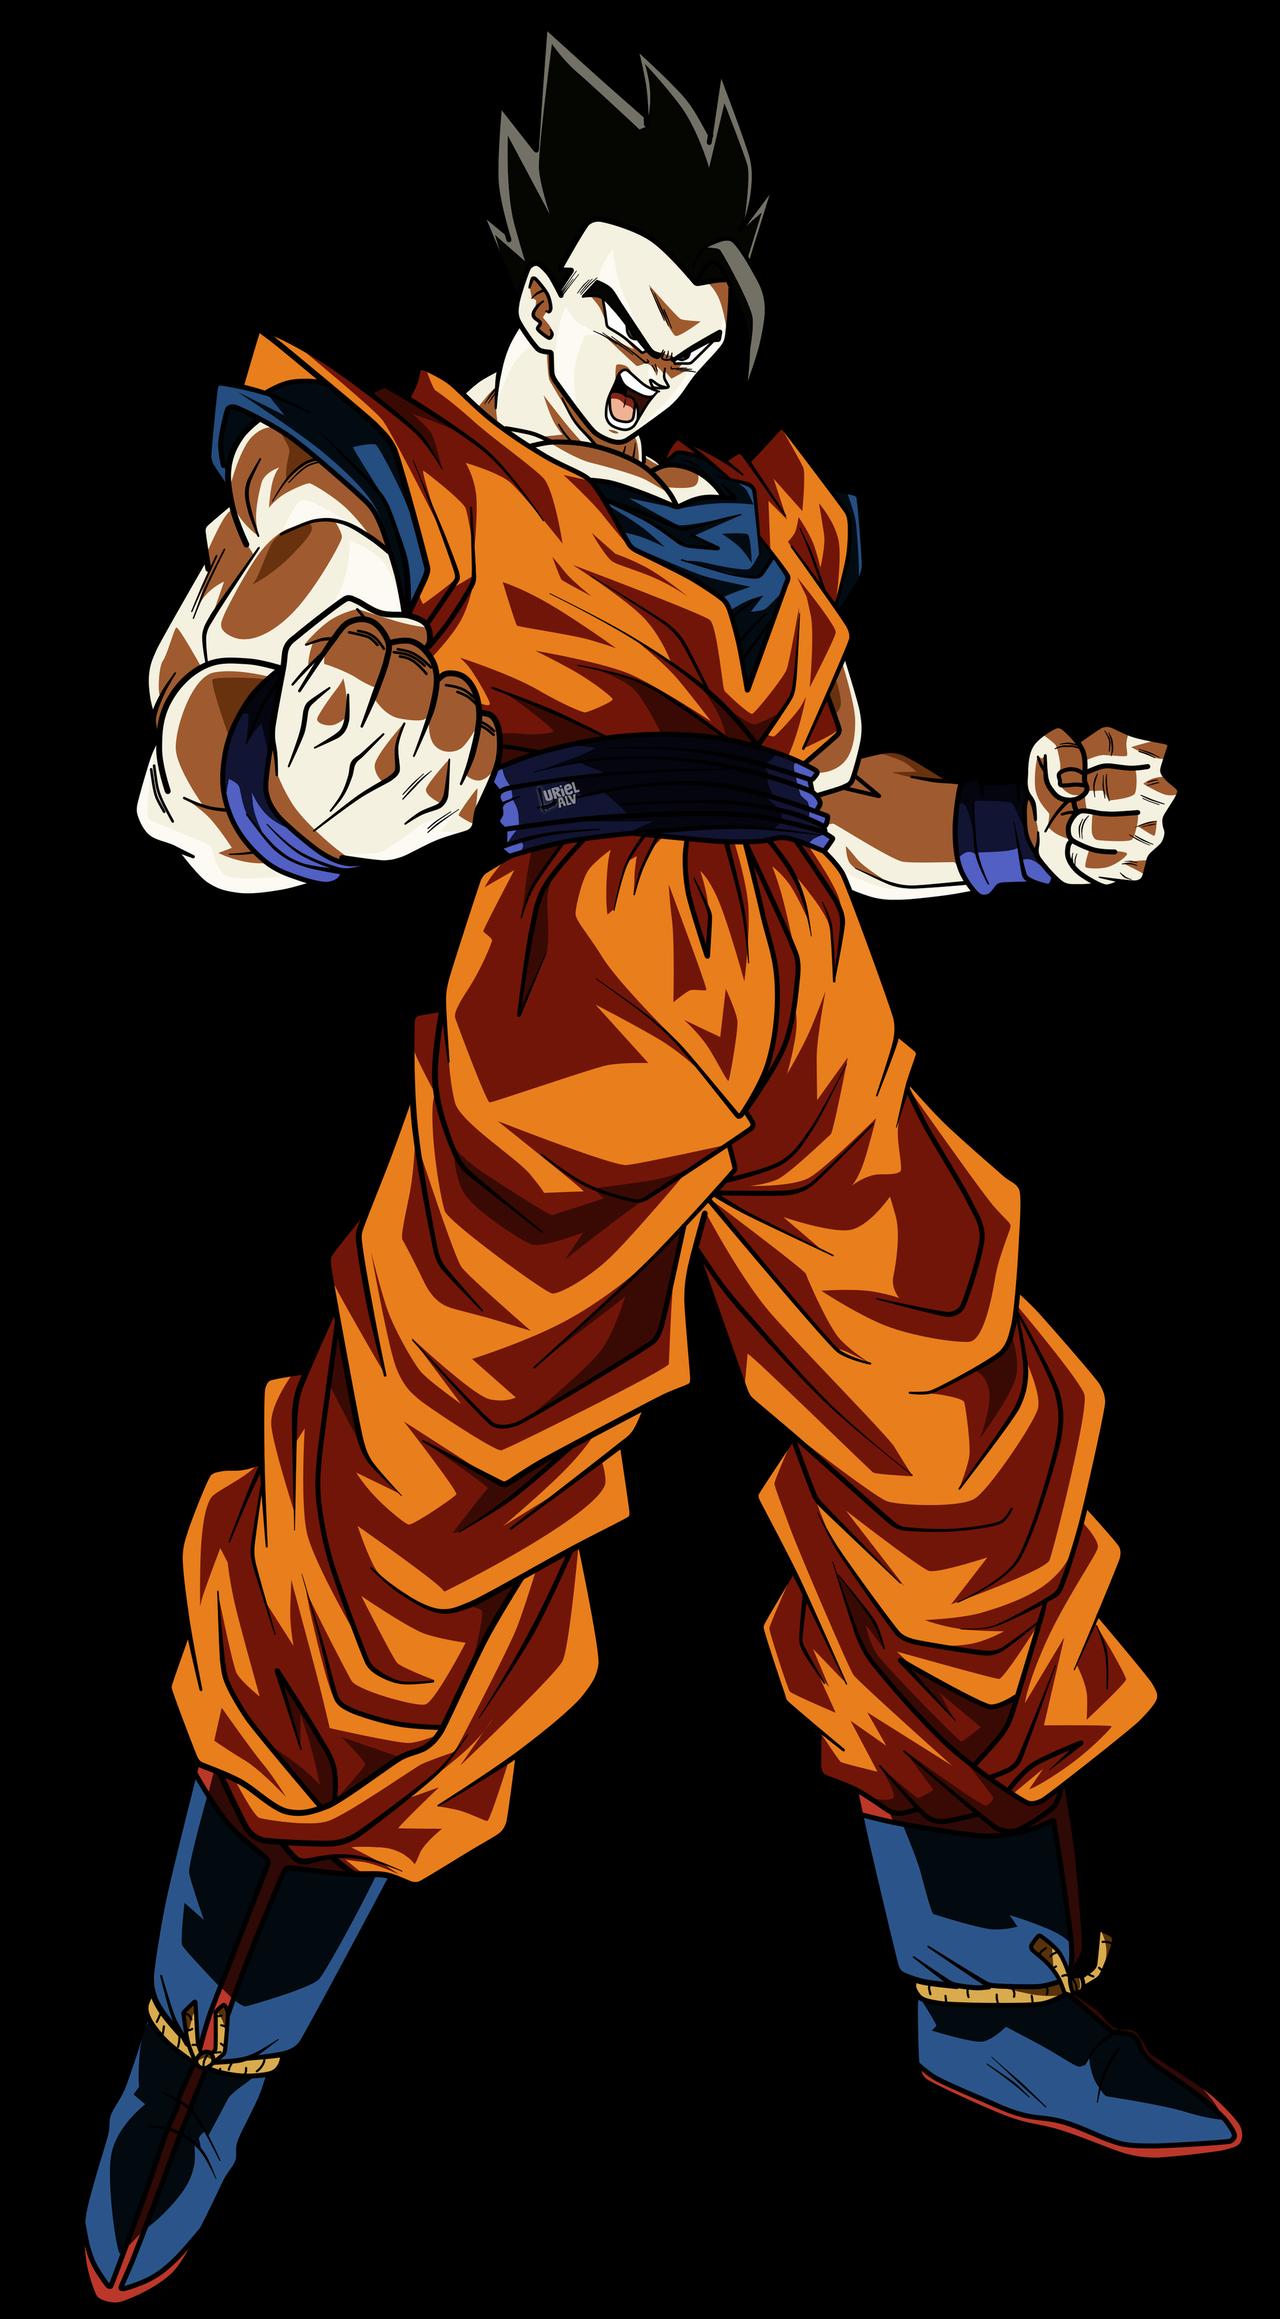 Gohan 3 By Urielalv Anime Dragon Ball Super Dragon Ball Artwork Dragon Ball Super Manga